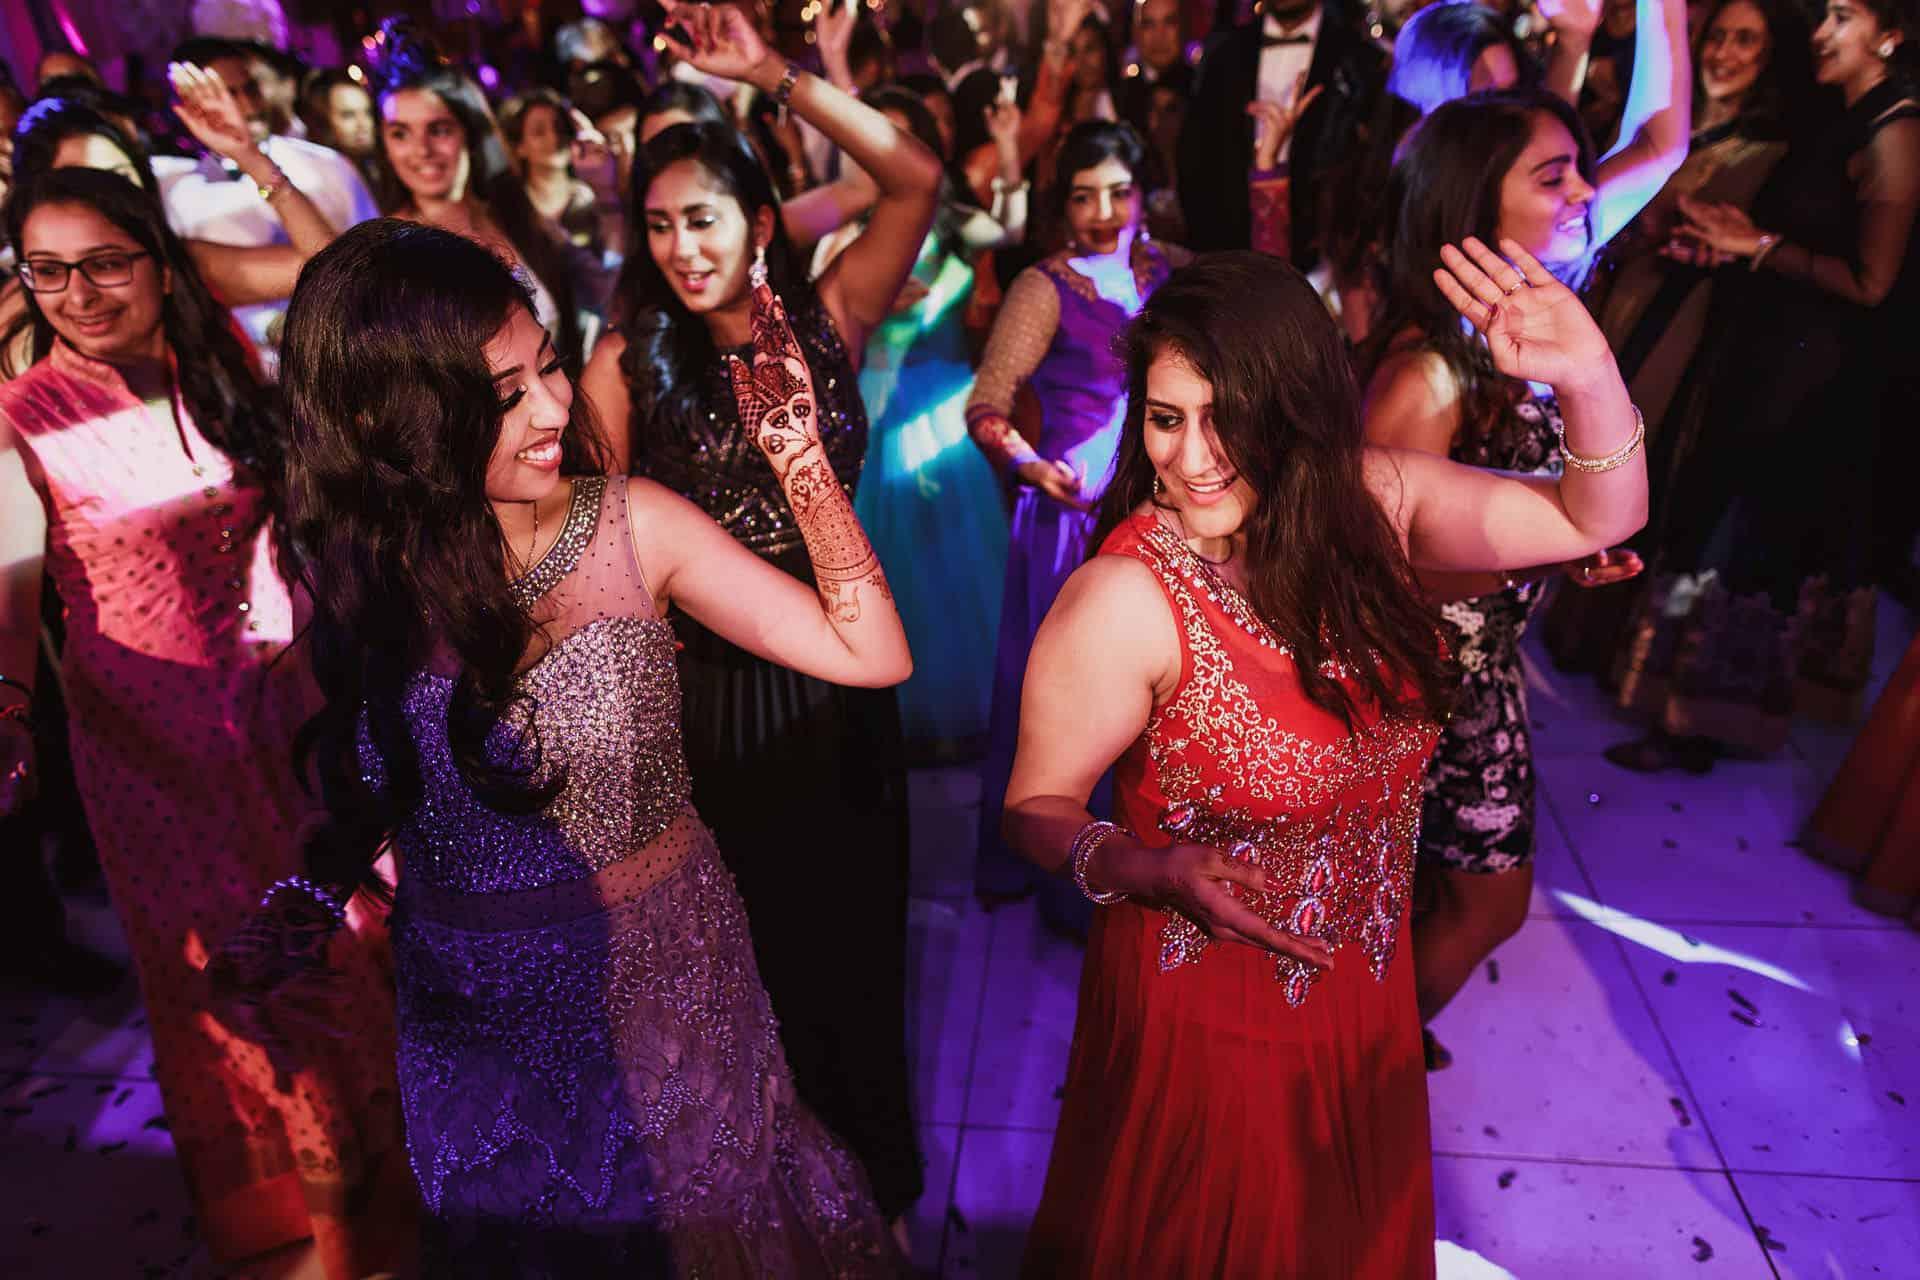 dallas burston wedding hindu photography